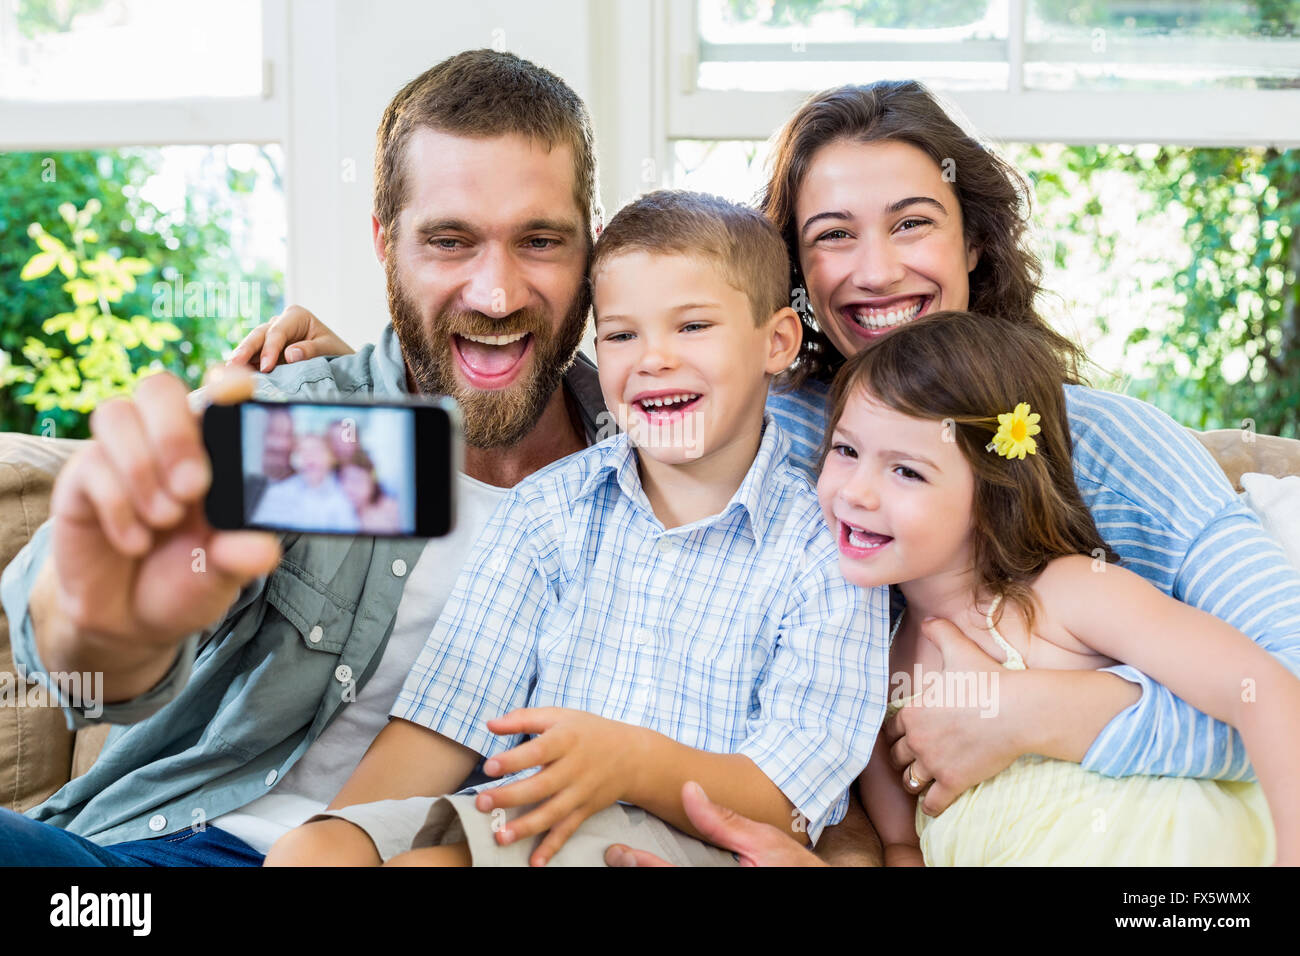 Smiling family taking selfie Stock Photo